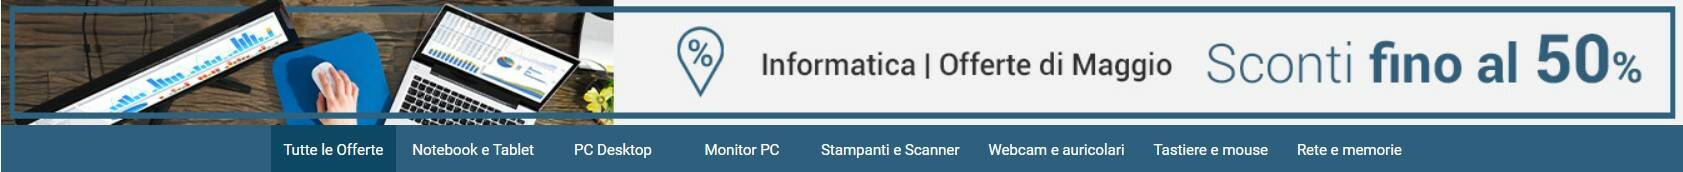 informatica_monclick